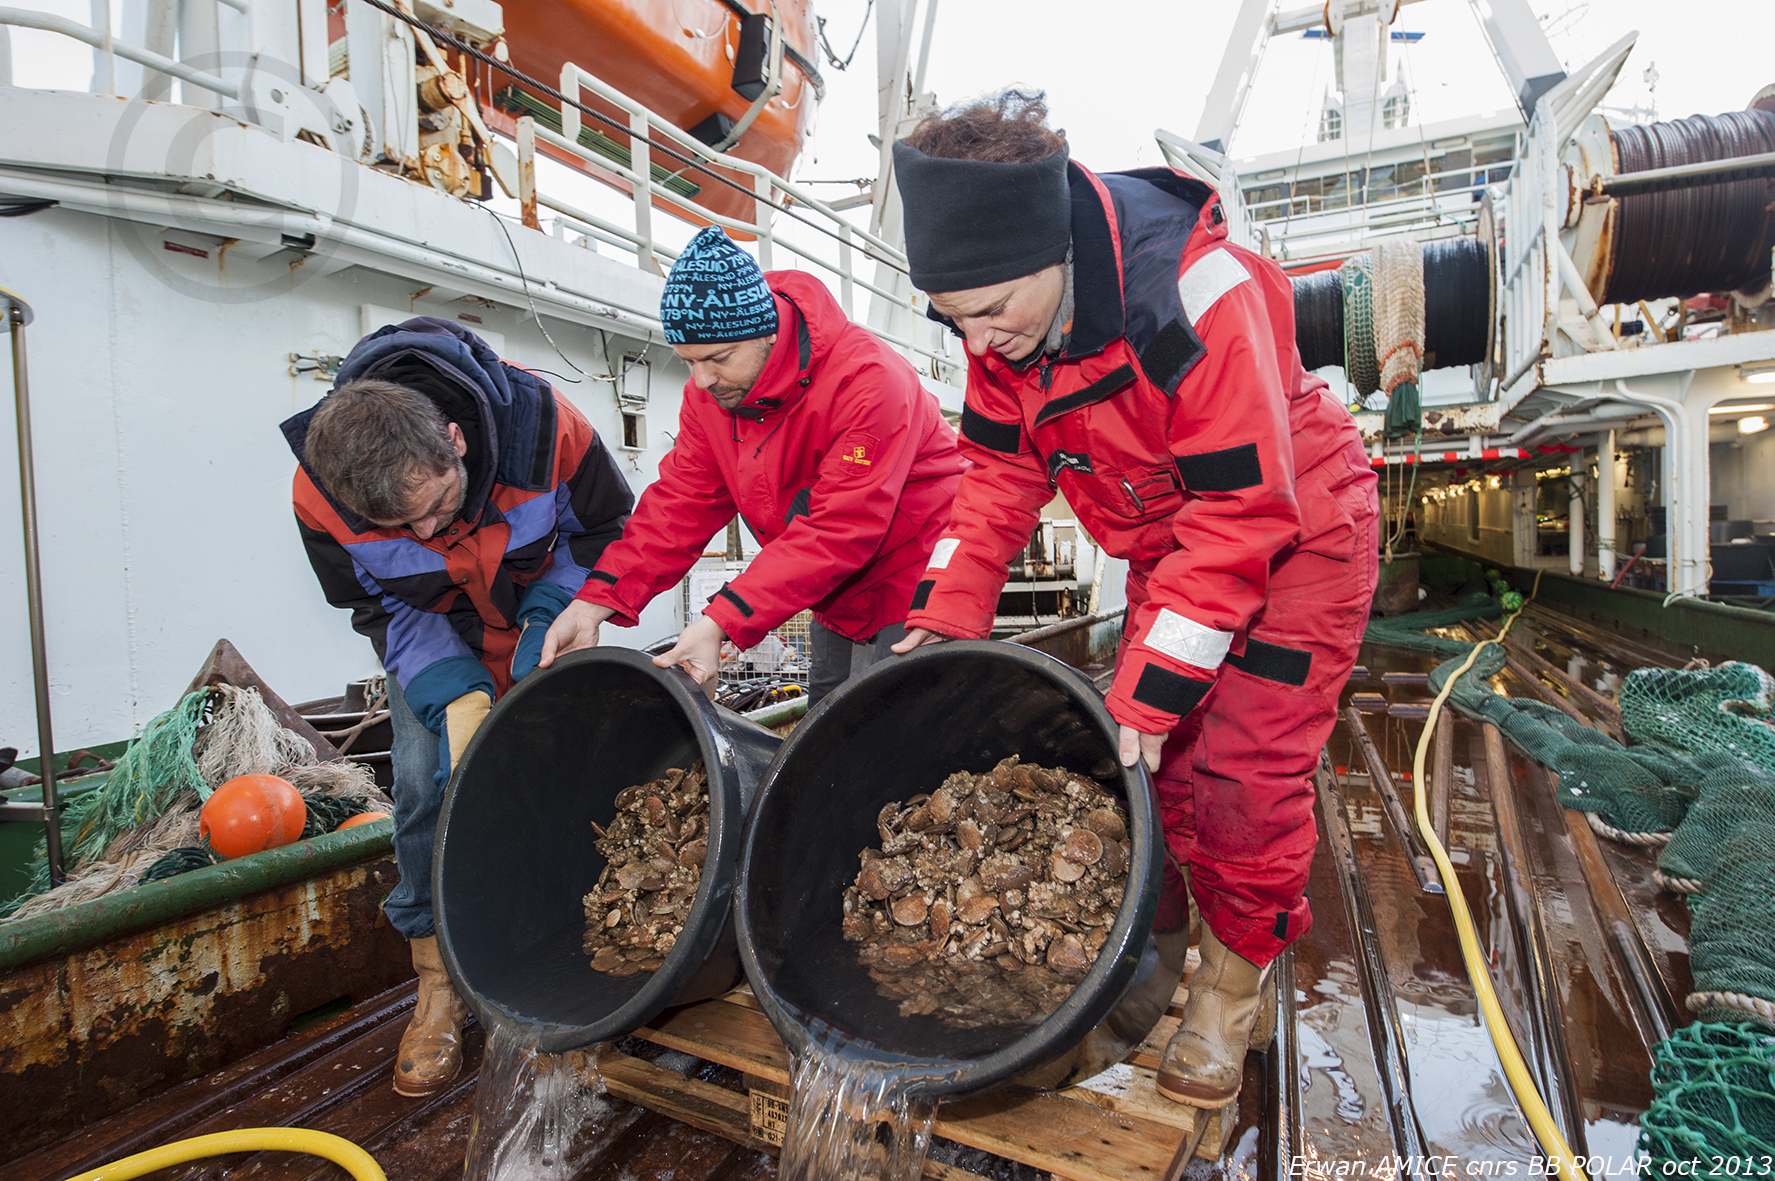 Mission à Kongsfjorden (Spitzberg) - Septembre 2013 - Chlamys fishing